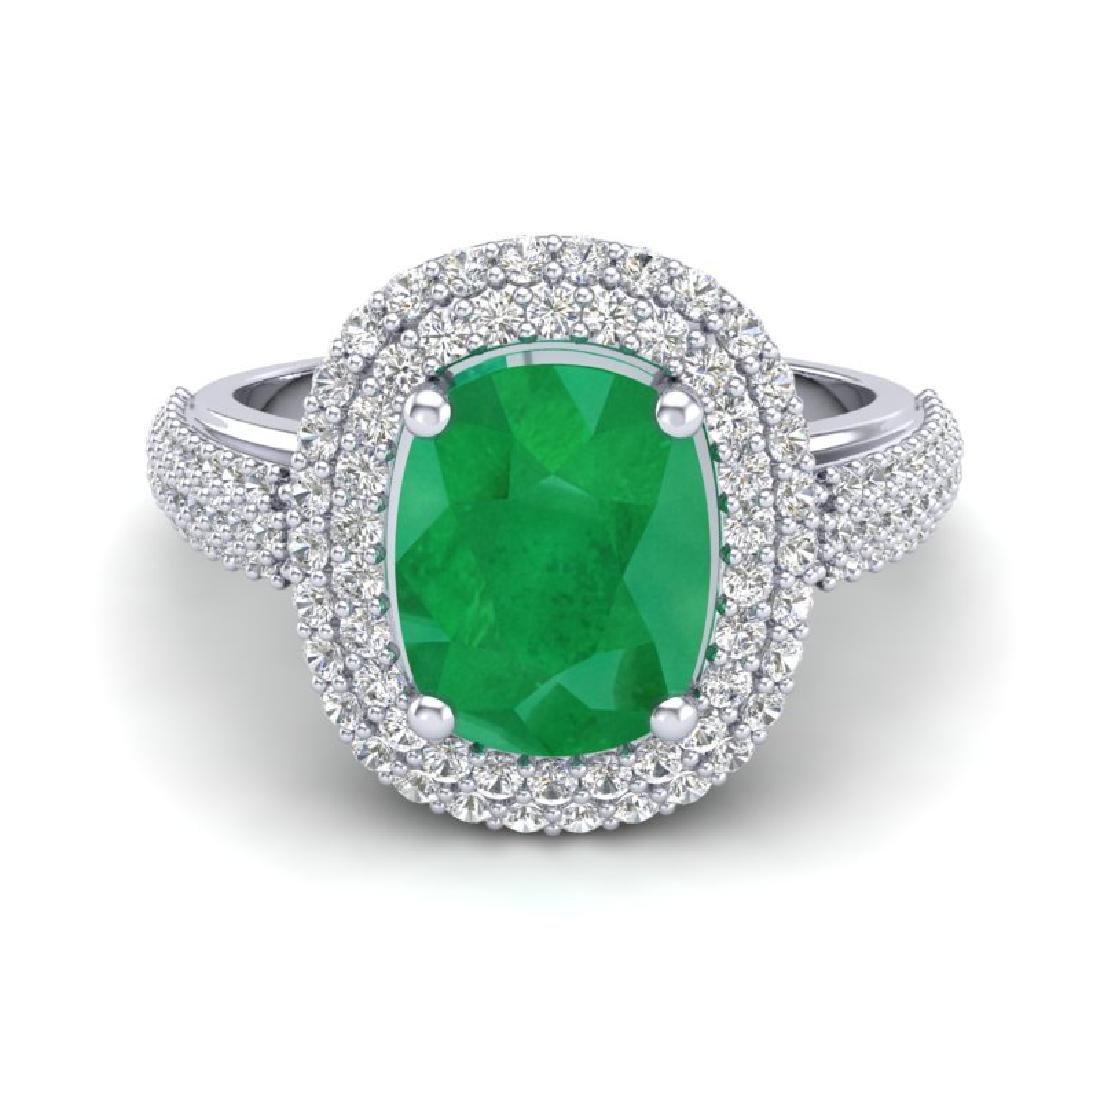 3.50 CTW Emerald & Micro Pave VS/SI Diamond Halo Ring